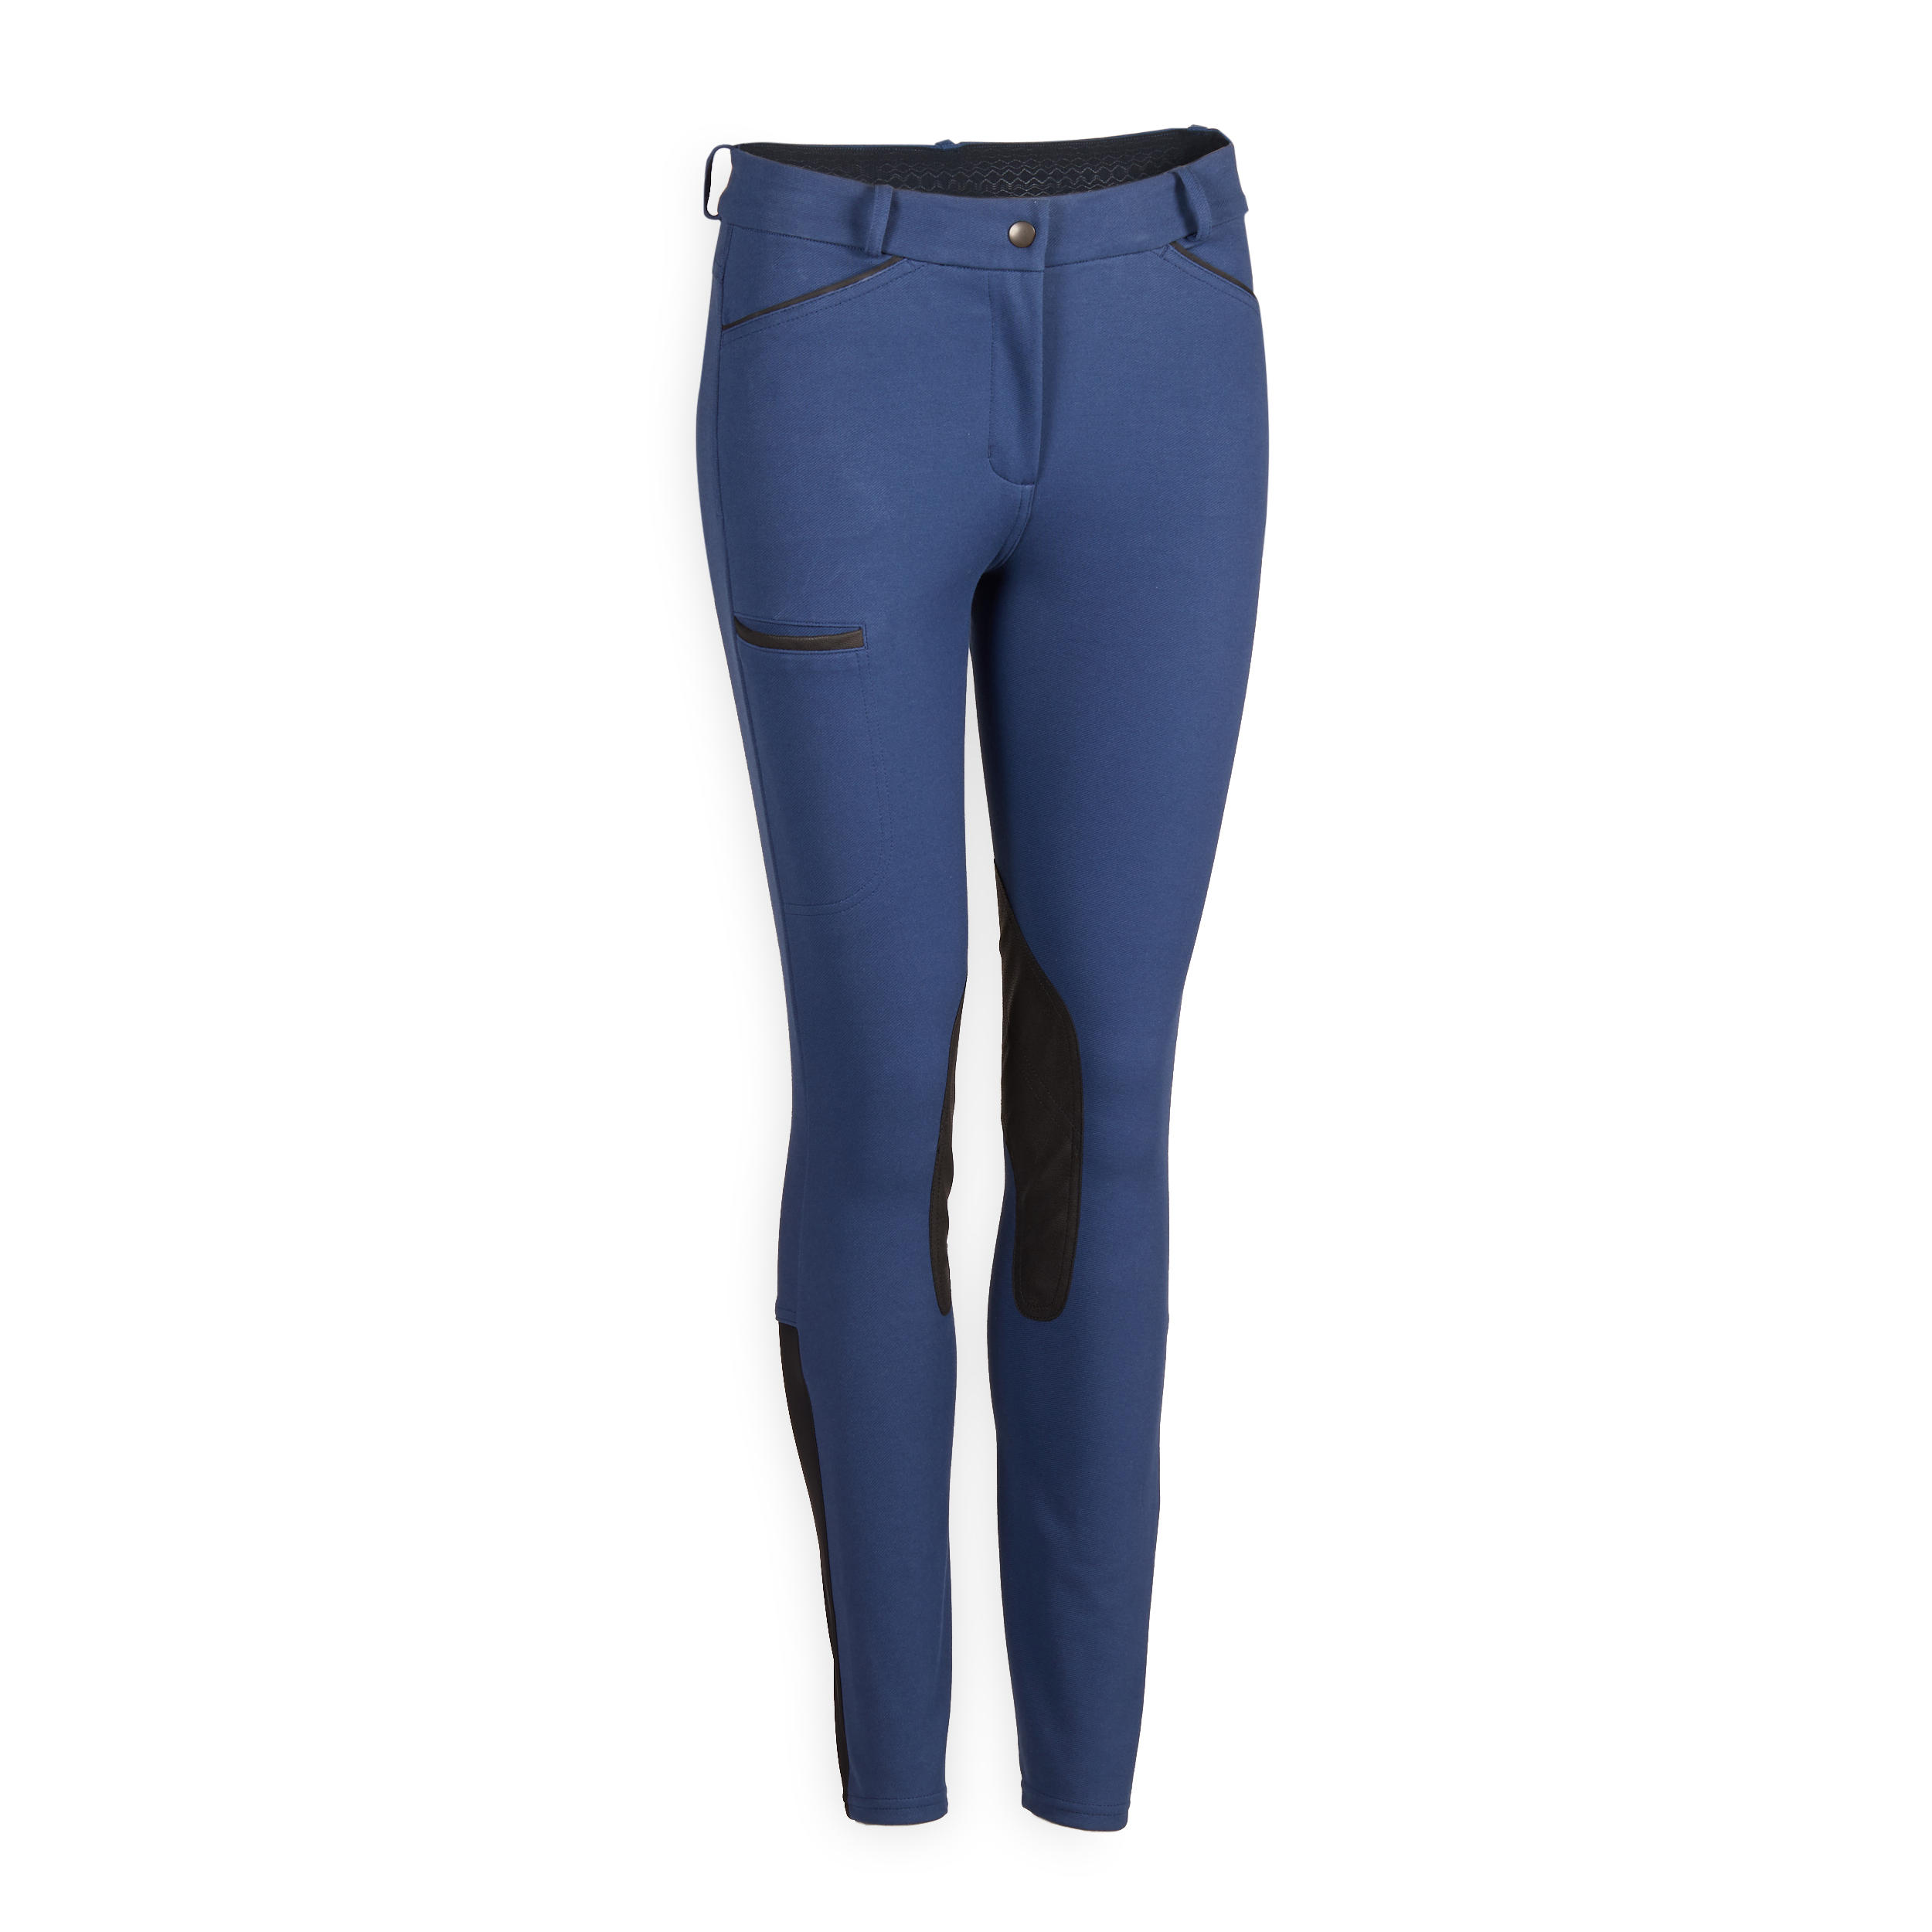 Pantalon Echitație 150 Damă imagine